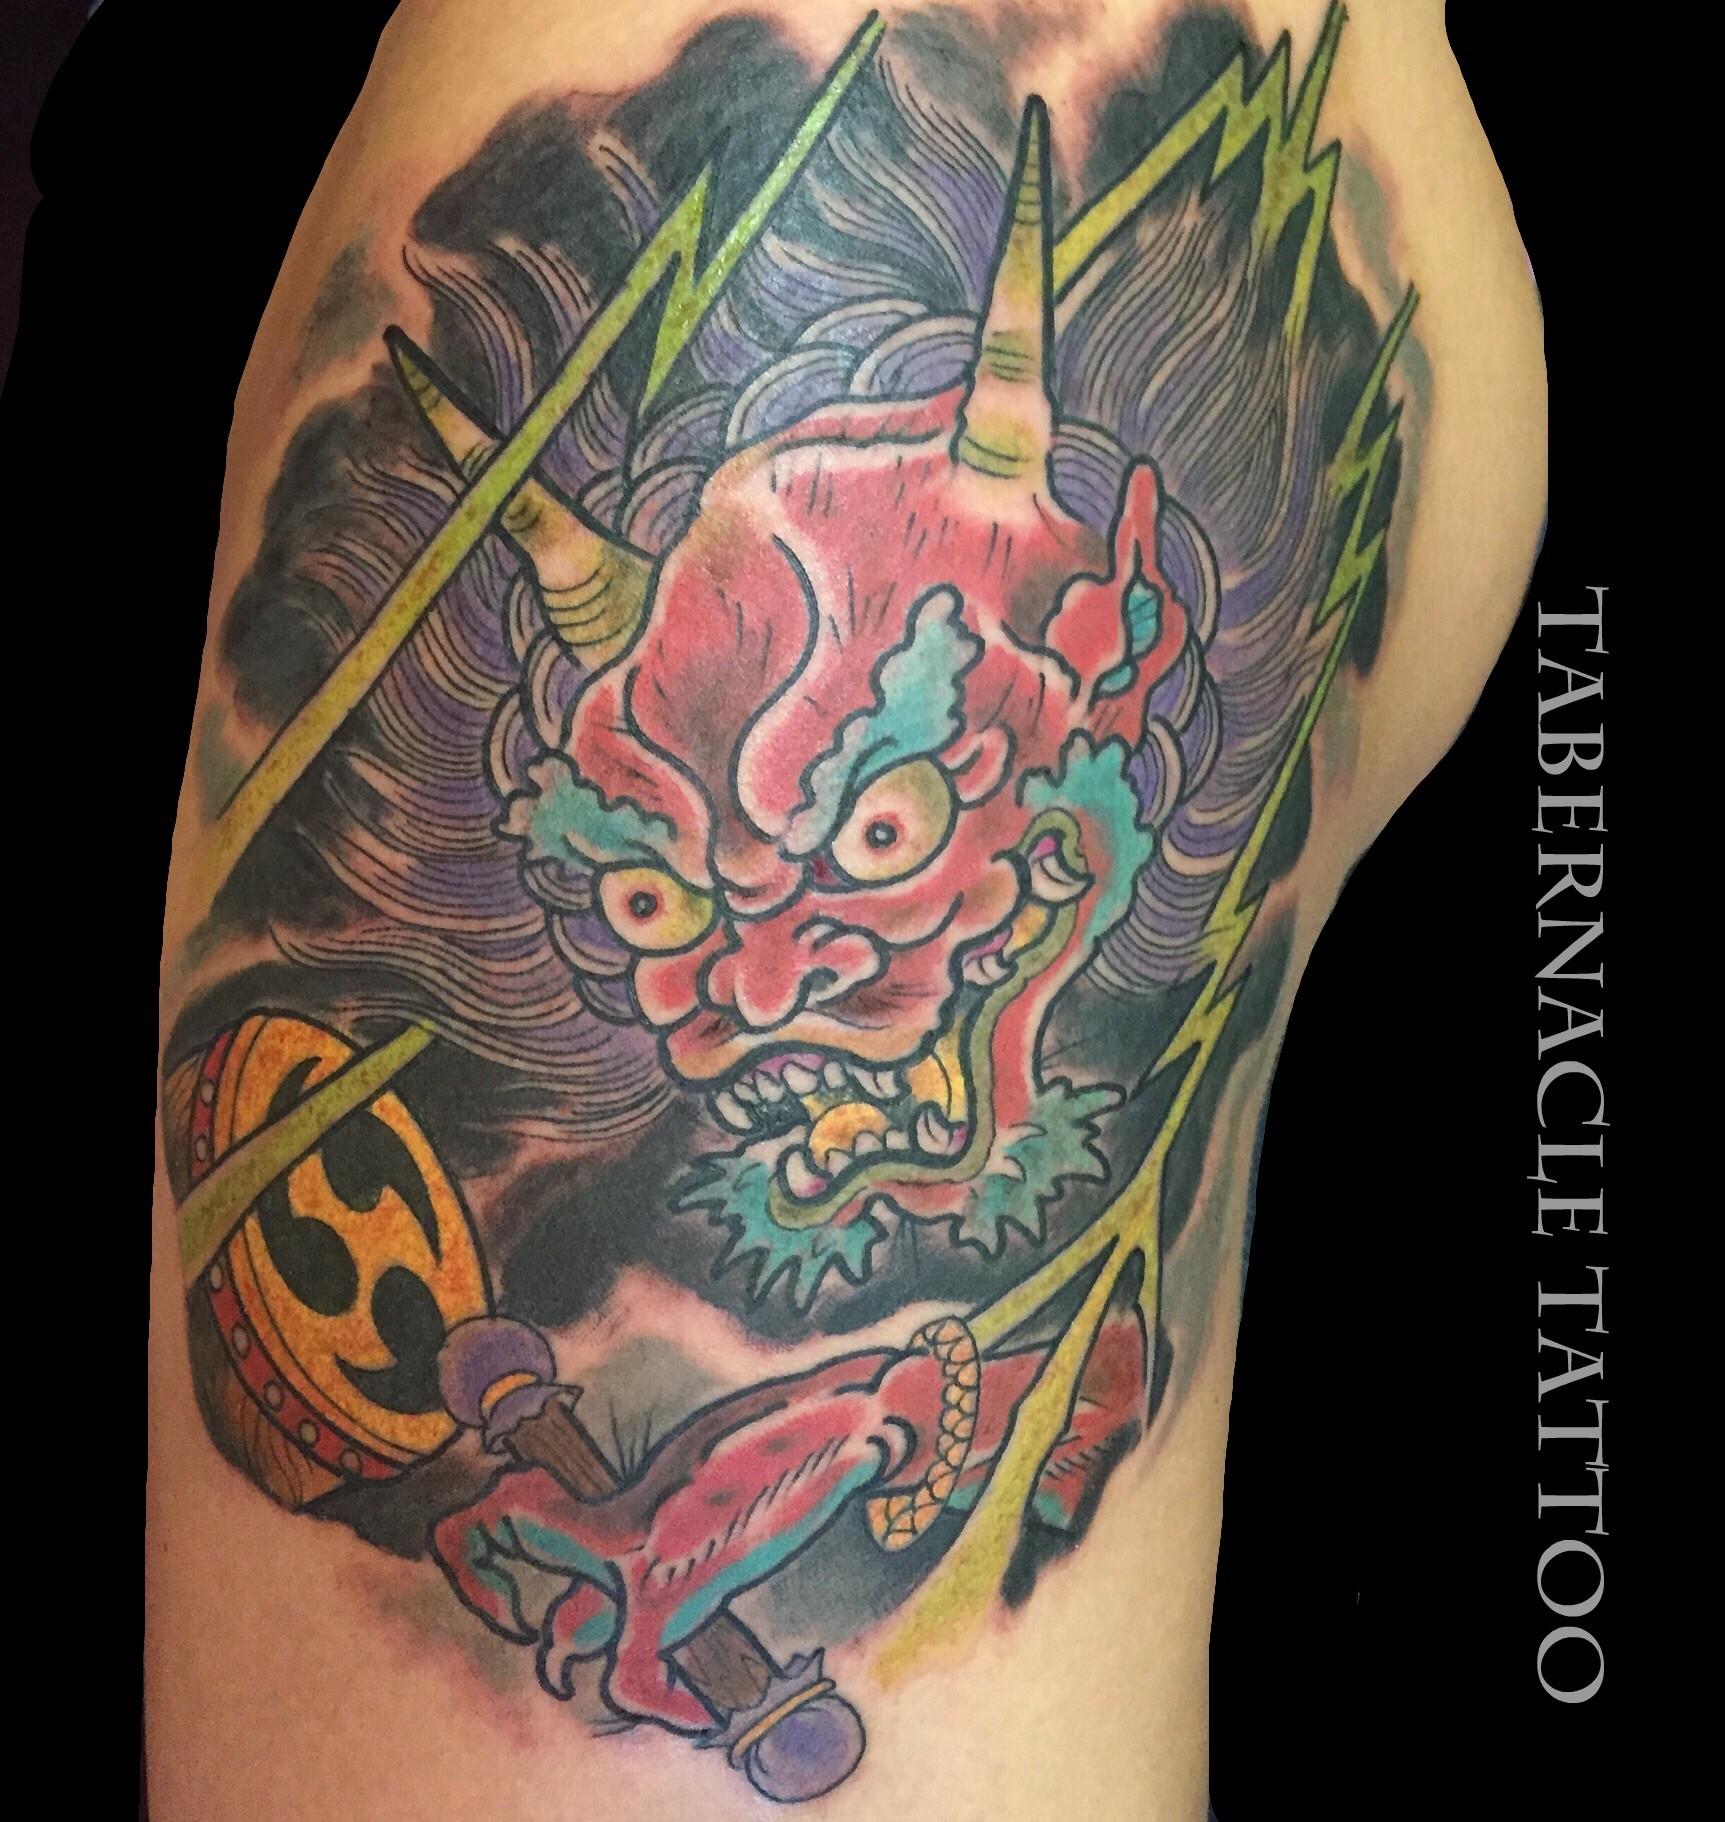 Raijin tattoo tabernacle tattoo tampa florida for Tattoo shops in ybor